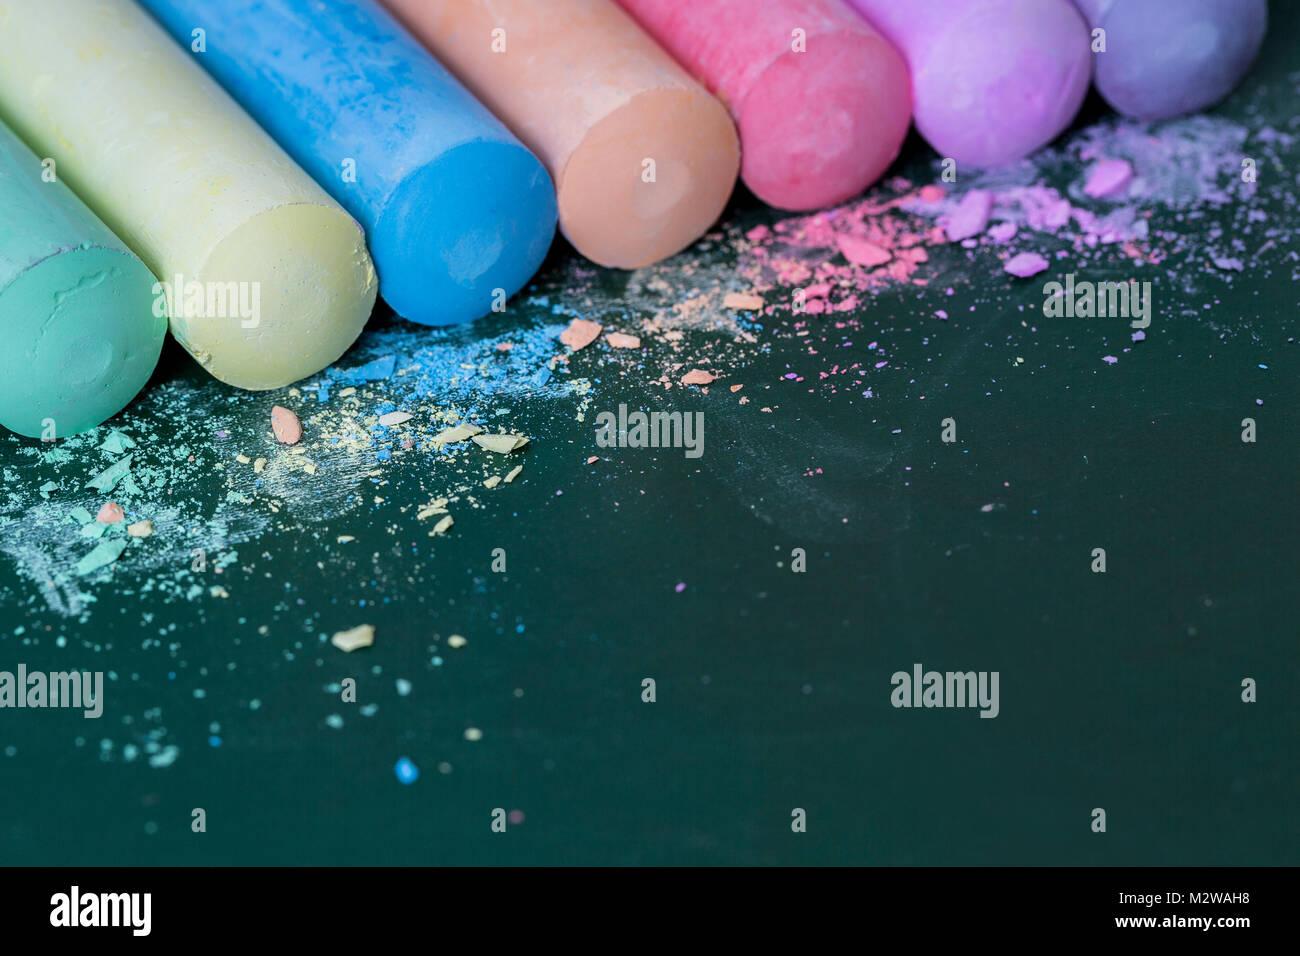 Pastel Chalk Arrangement Stockfotos & Pastel Chalk Arrangement ...